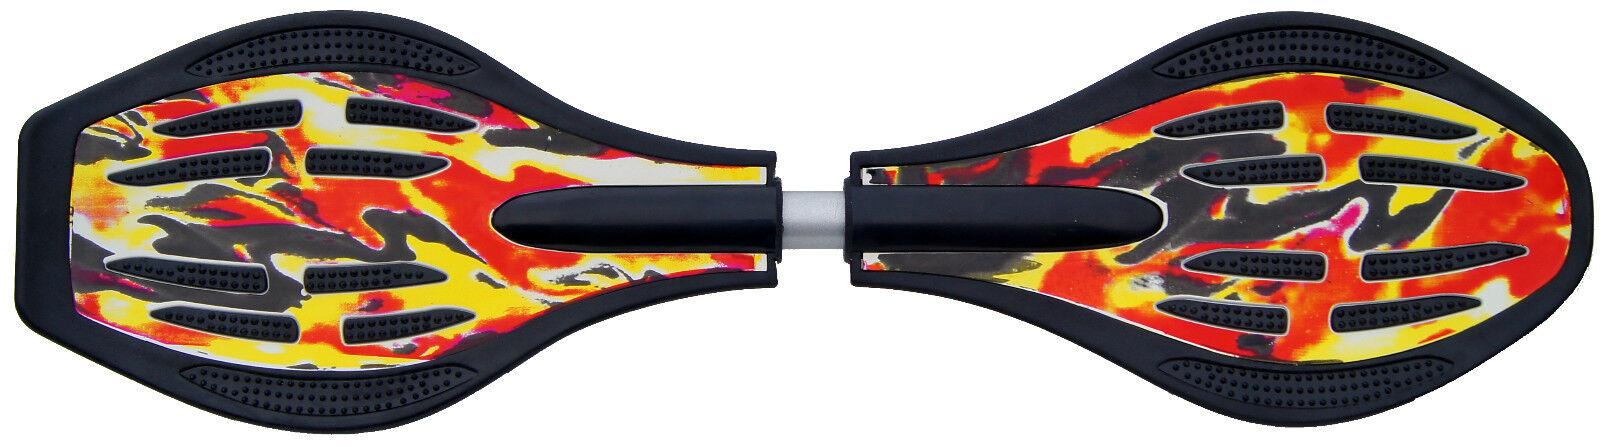 NIK FUNSPORT® Waveboard & mini Waveboard ABEC 7, Super Super Super LED-Rollen, Speed-Rollen fc938f